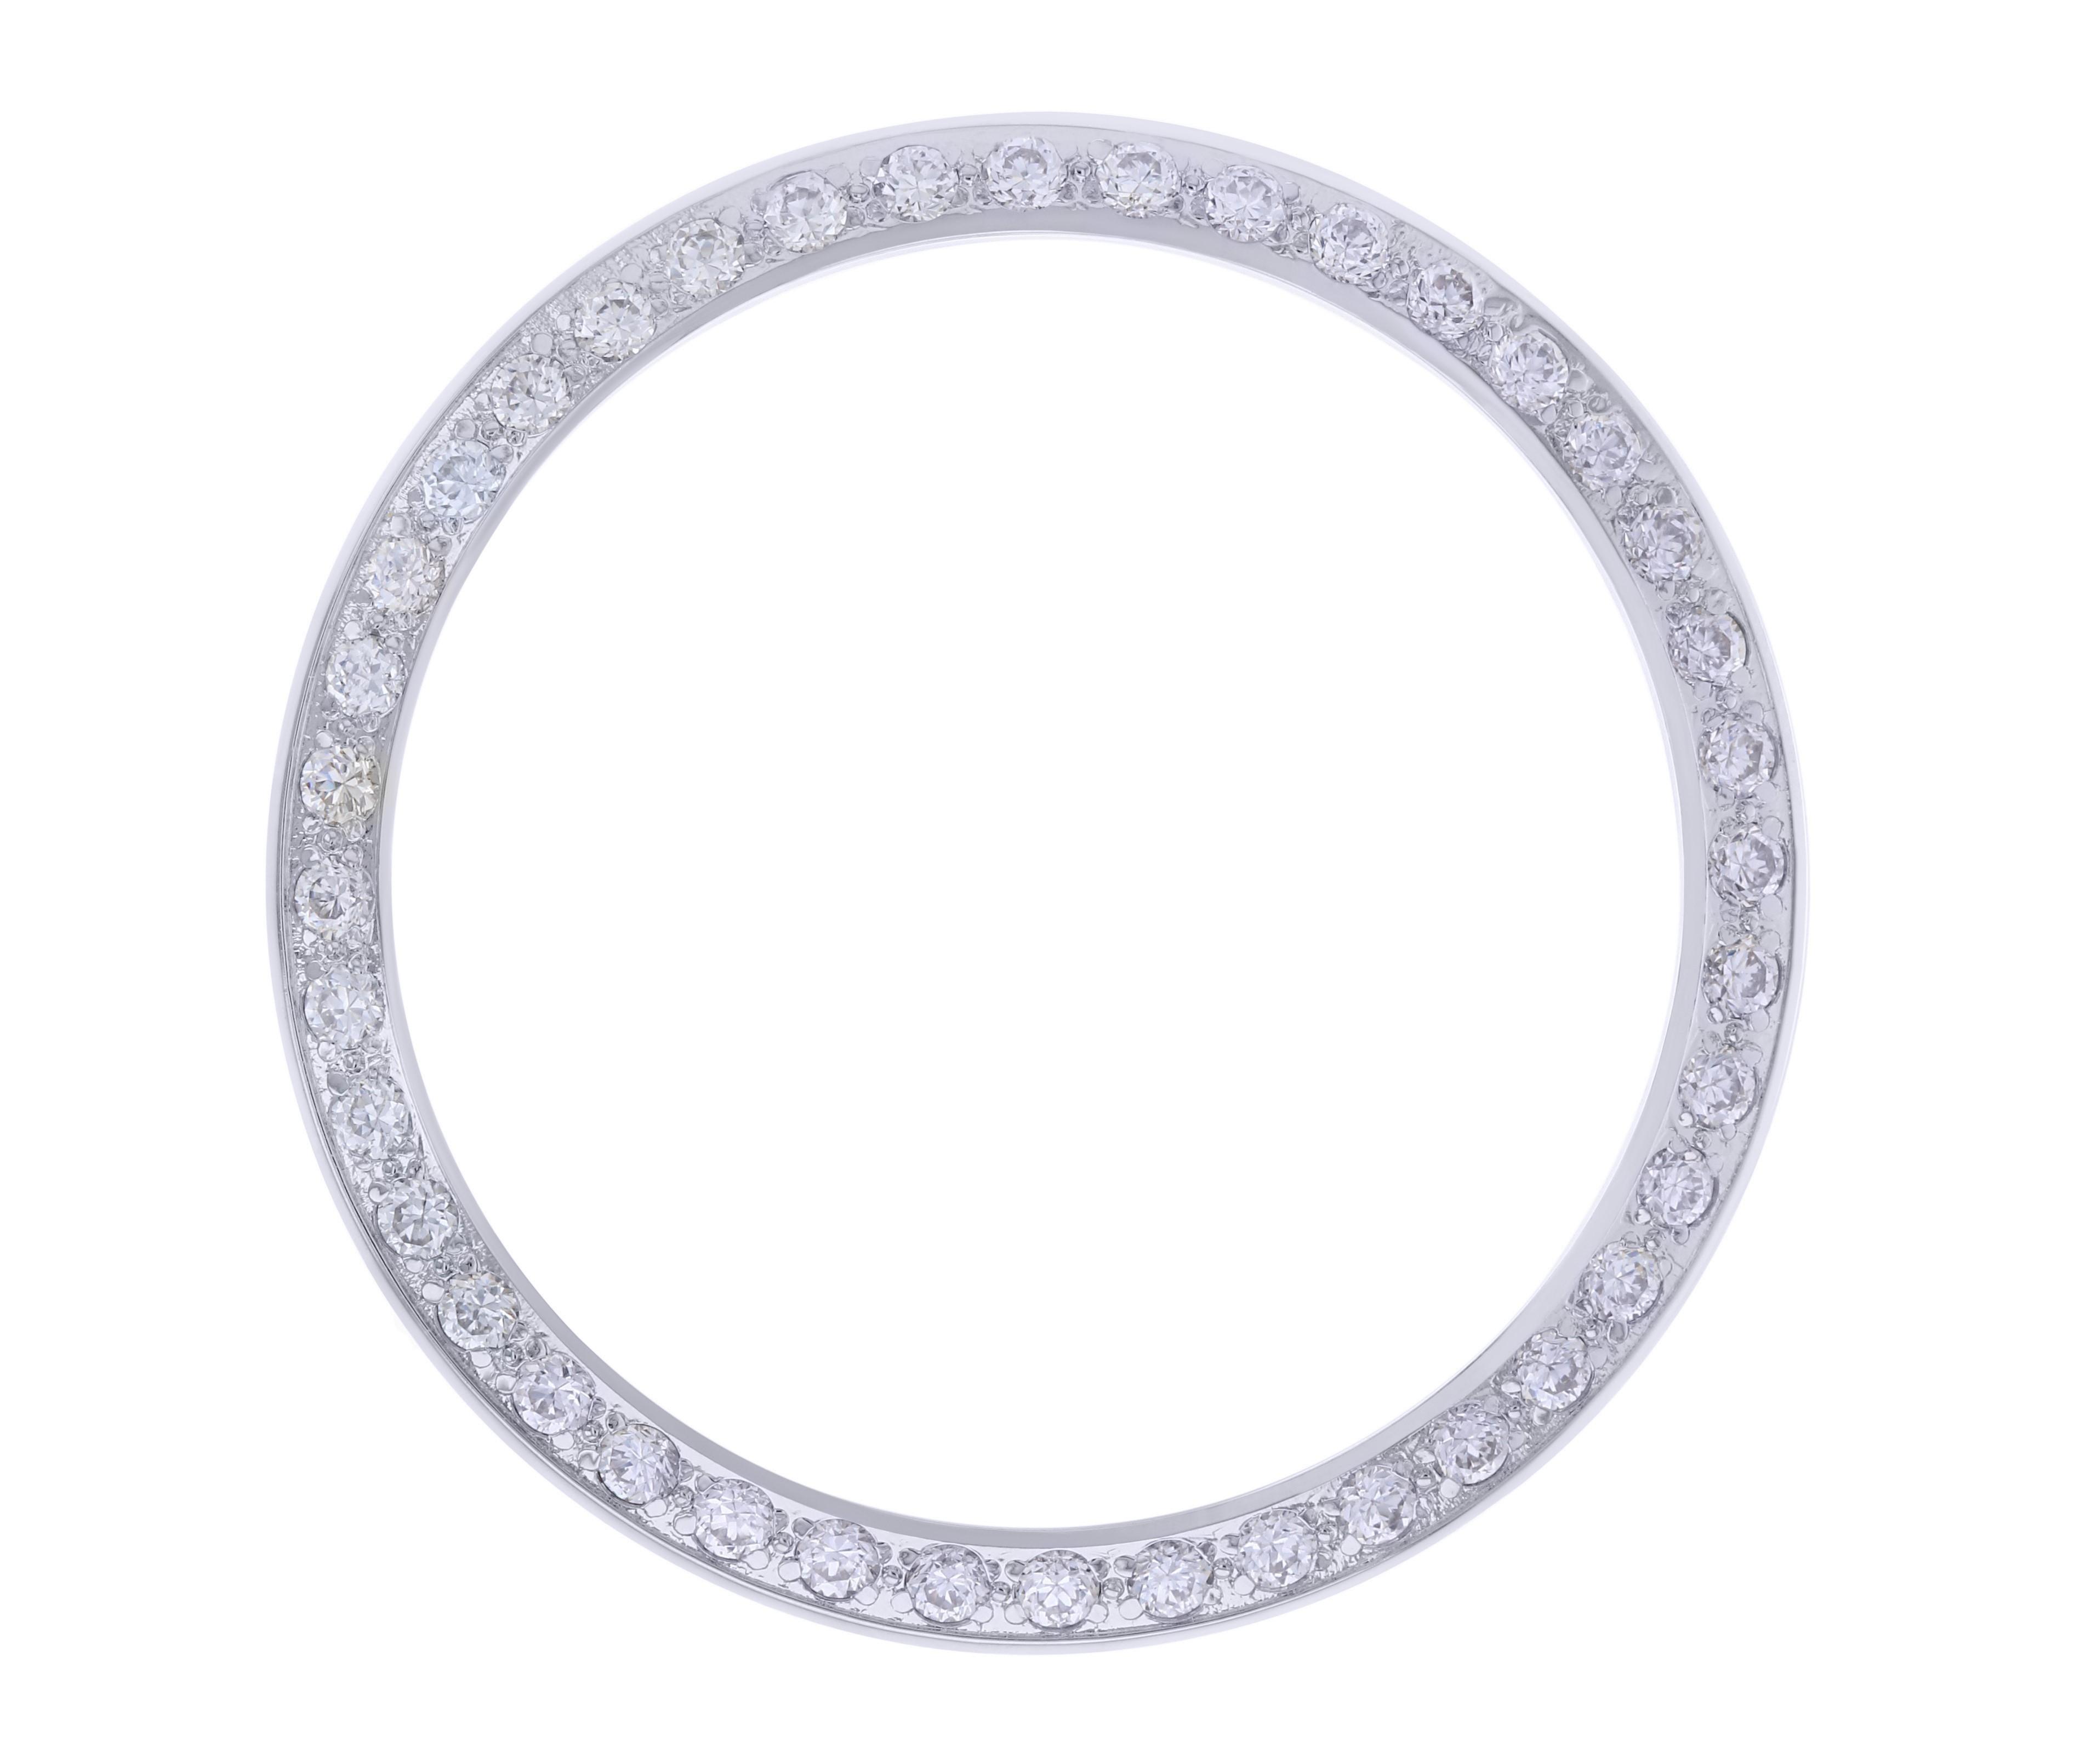 CREATED DIAMOND BEZEL FOR 36MM ROLEX TUDOR BLACK BAY AUTOMATIC WATCH WHITE